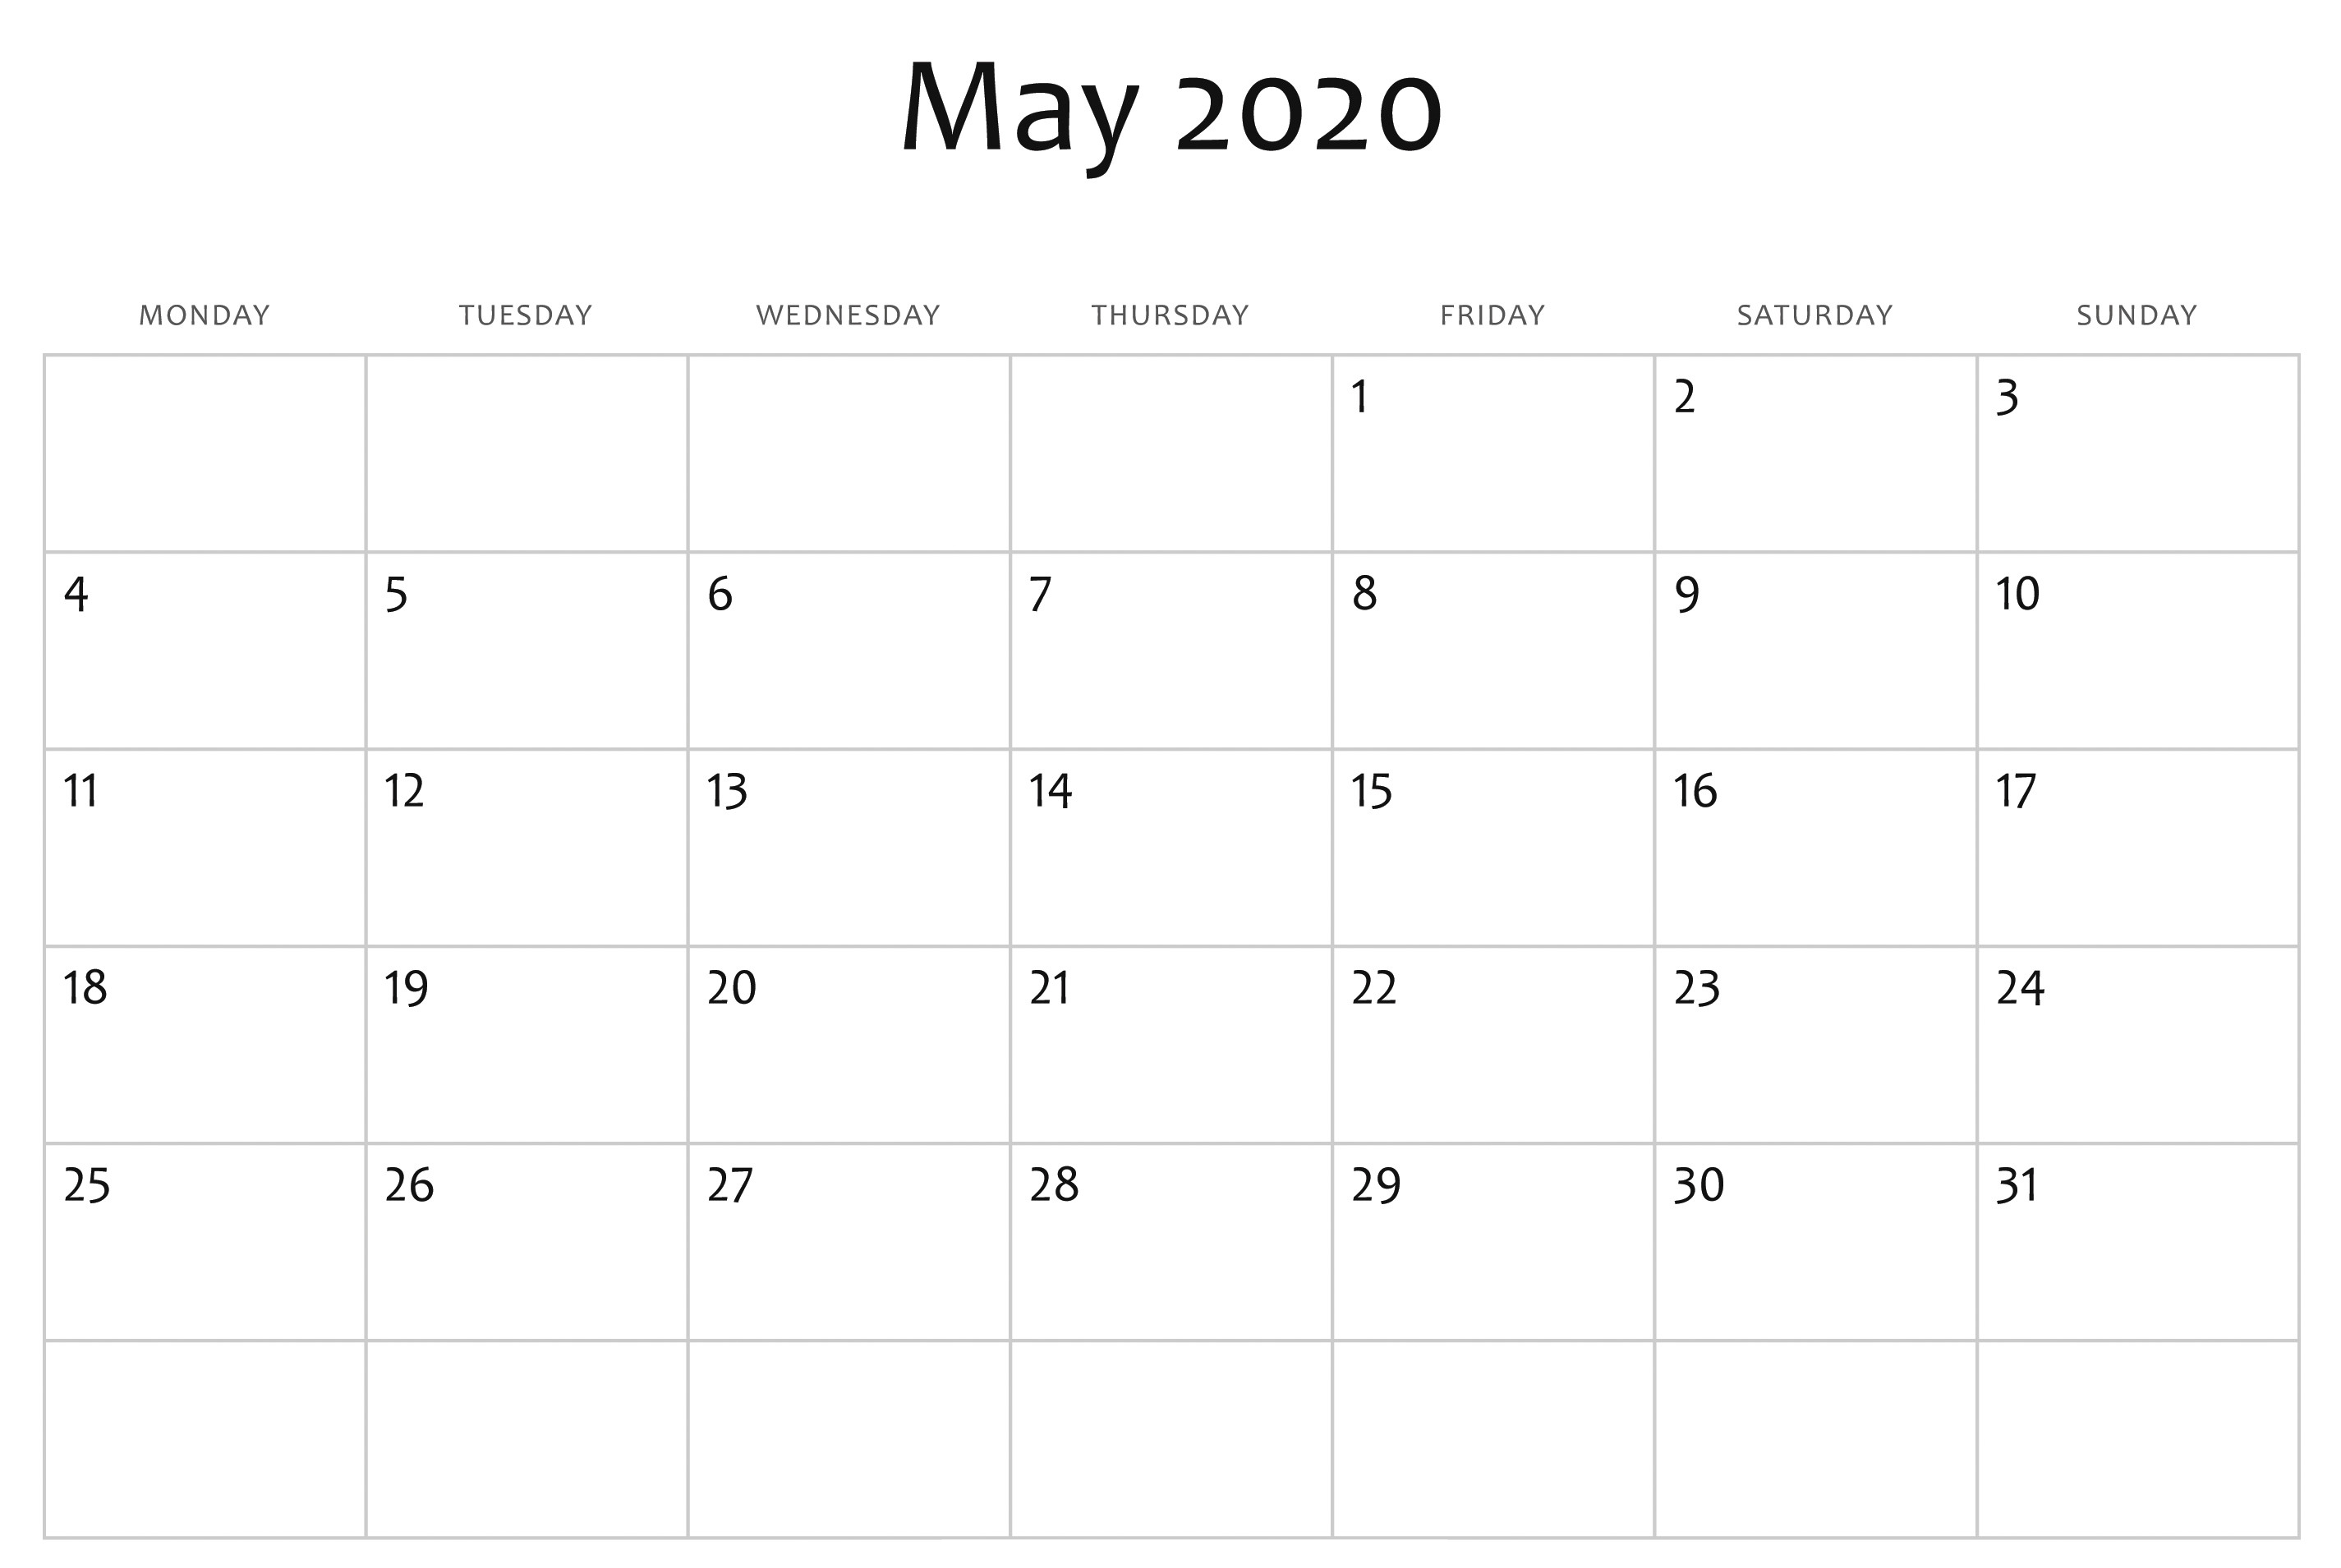 May 2020 Calendar Blank Template